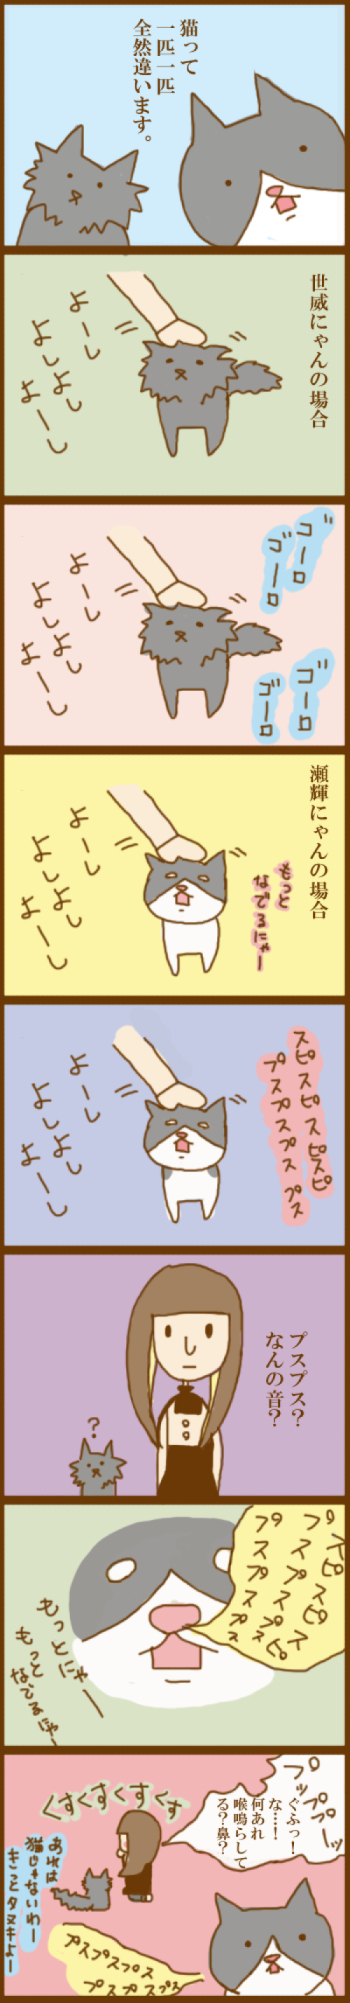 f:id:suzuokayu:20201017211209j:plain